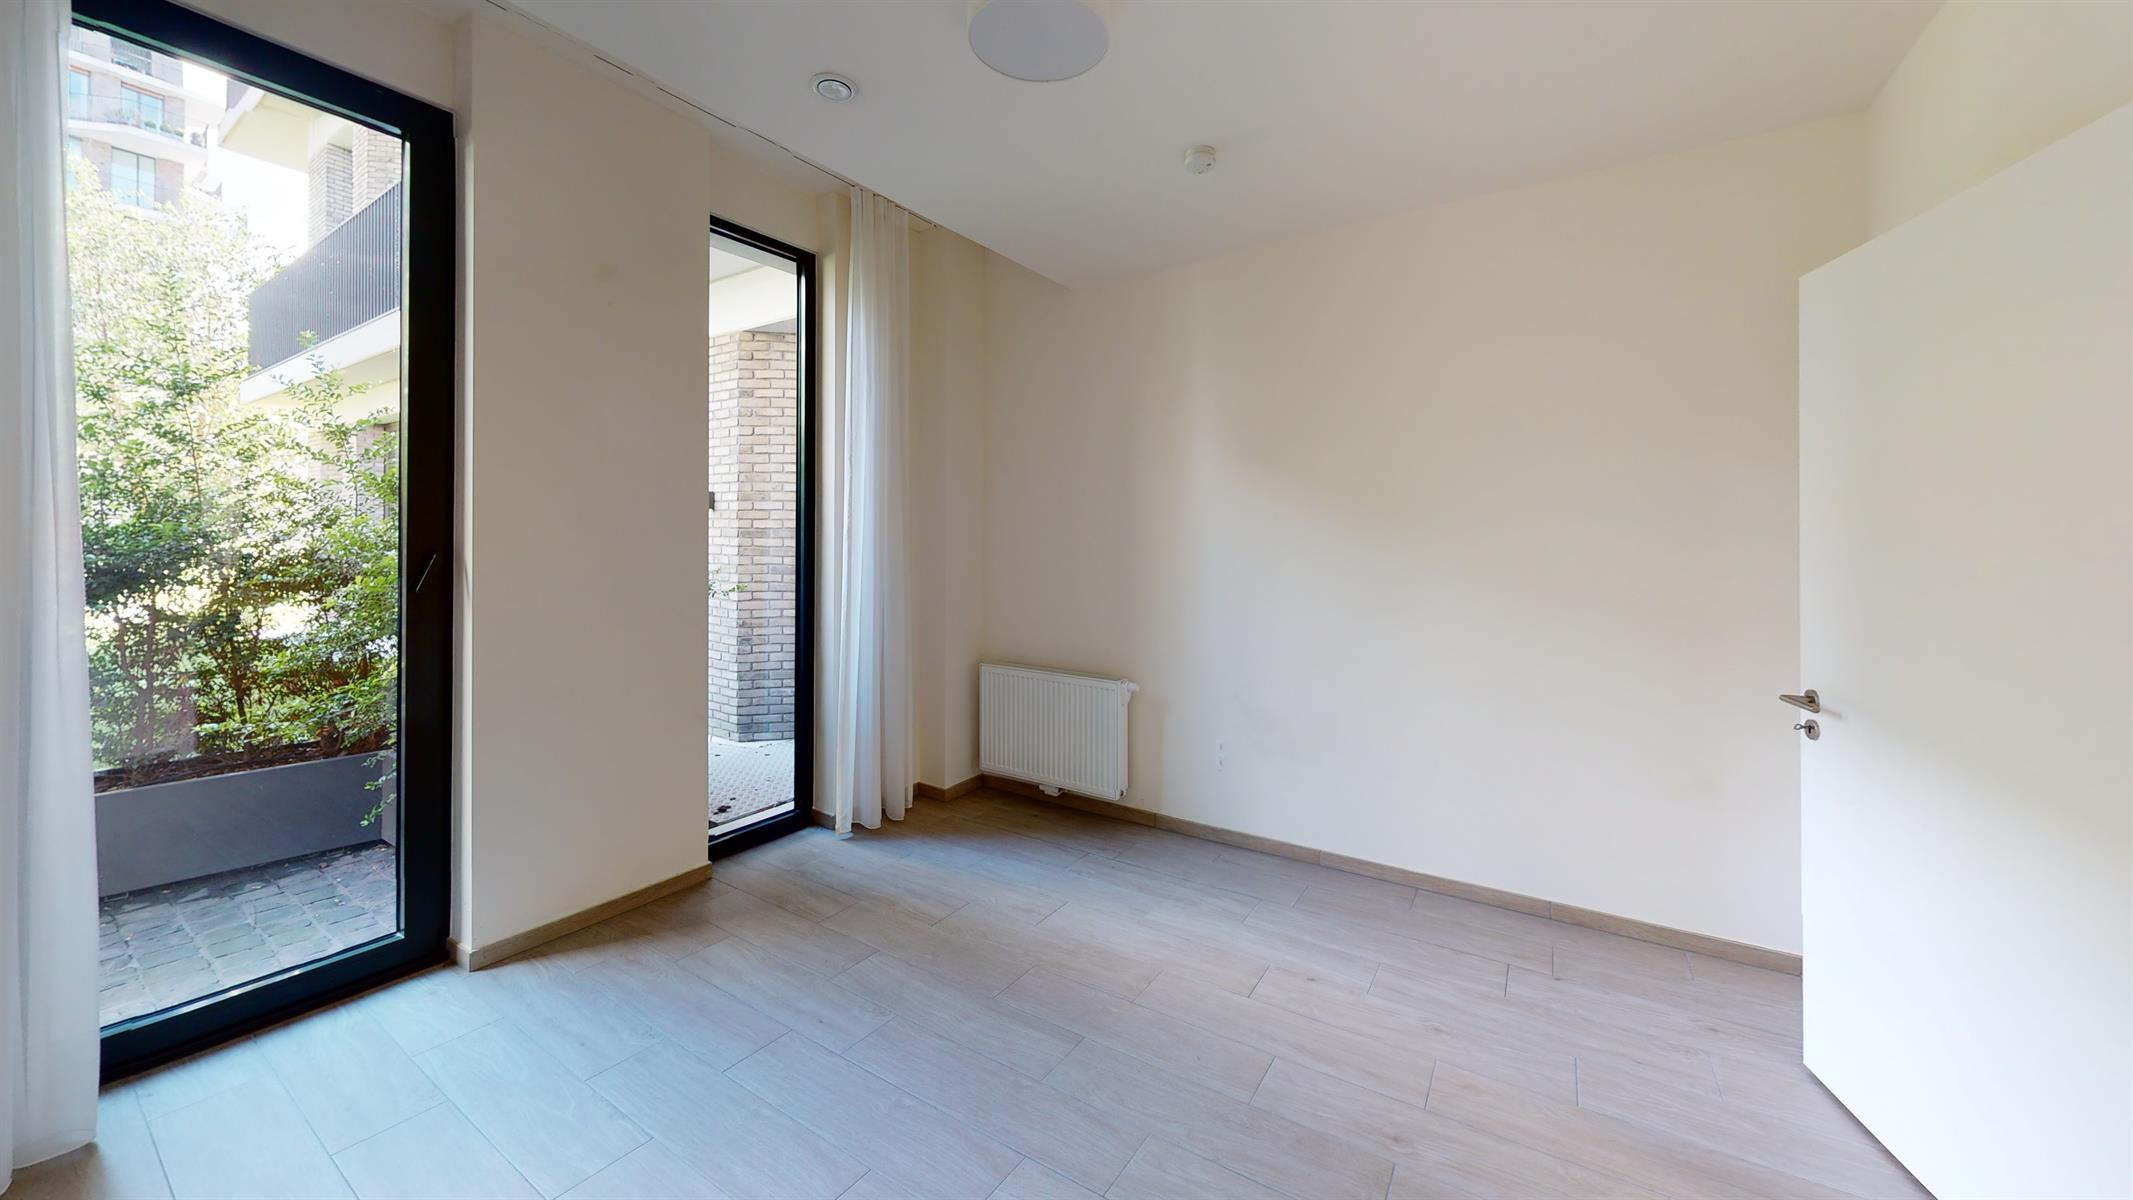 ka-a-2291-appartement-te-antwerpen 5